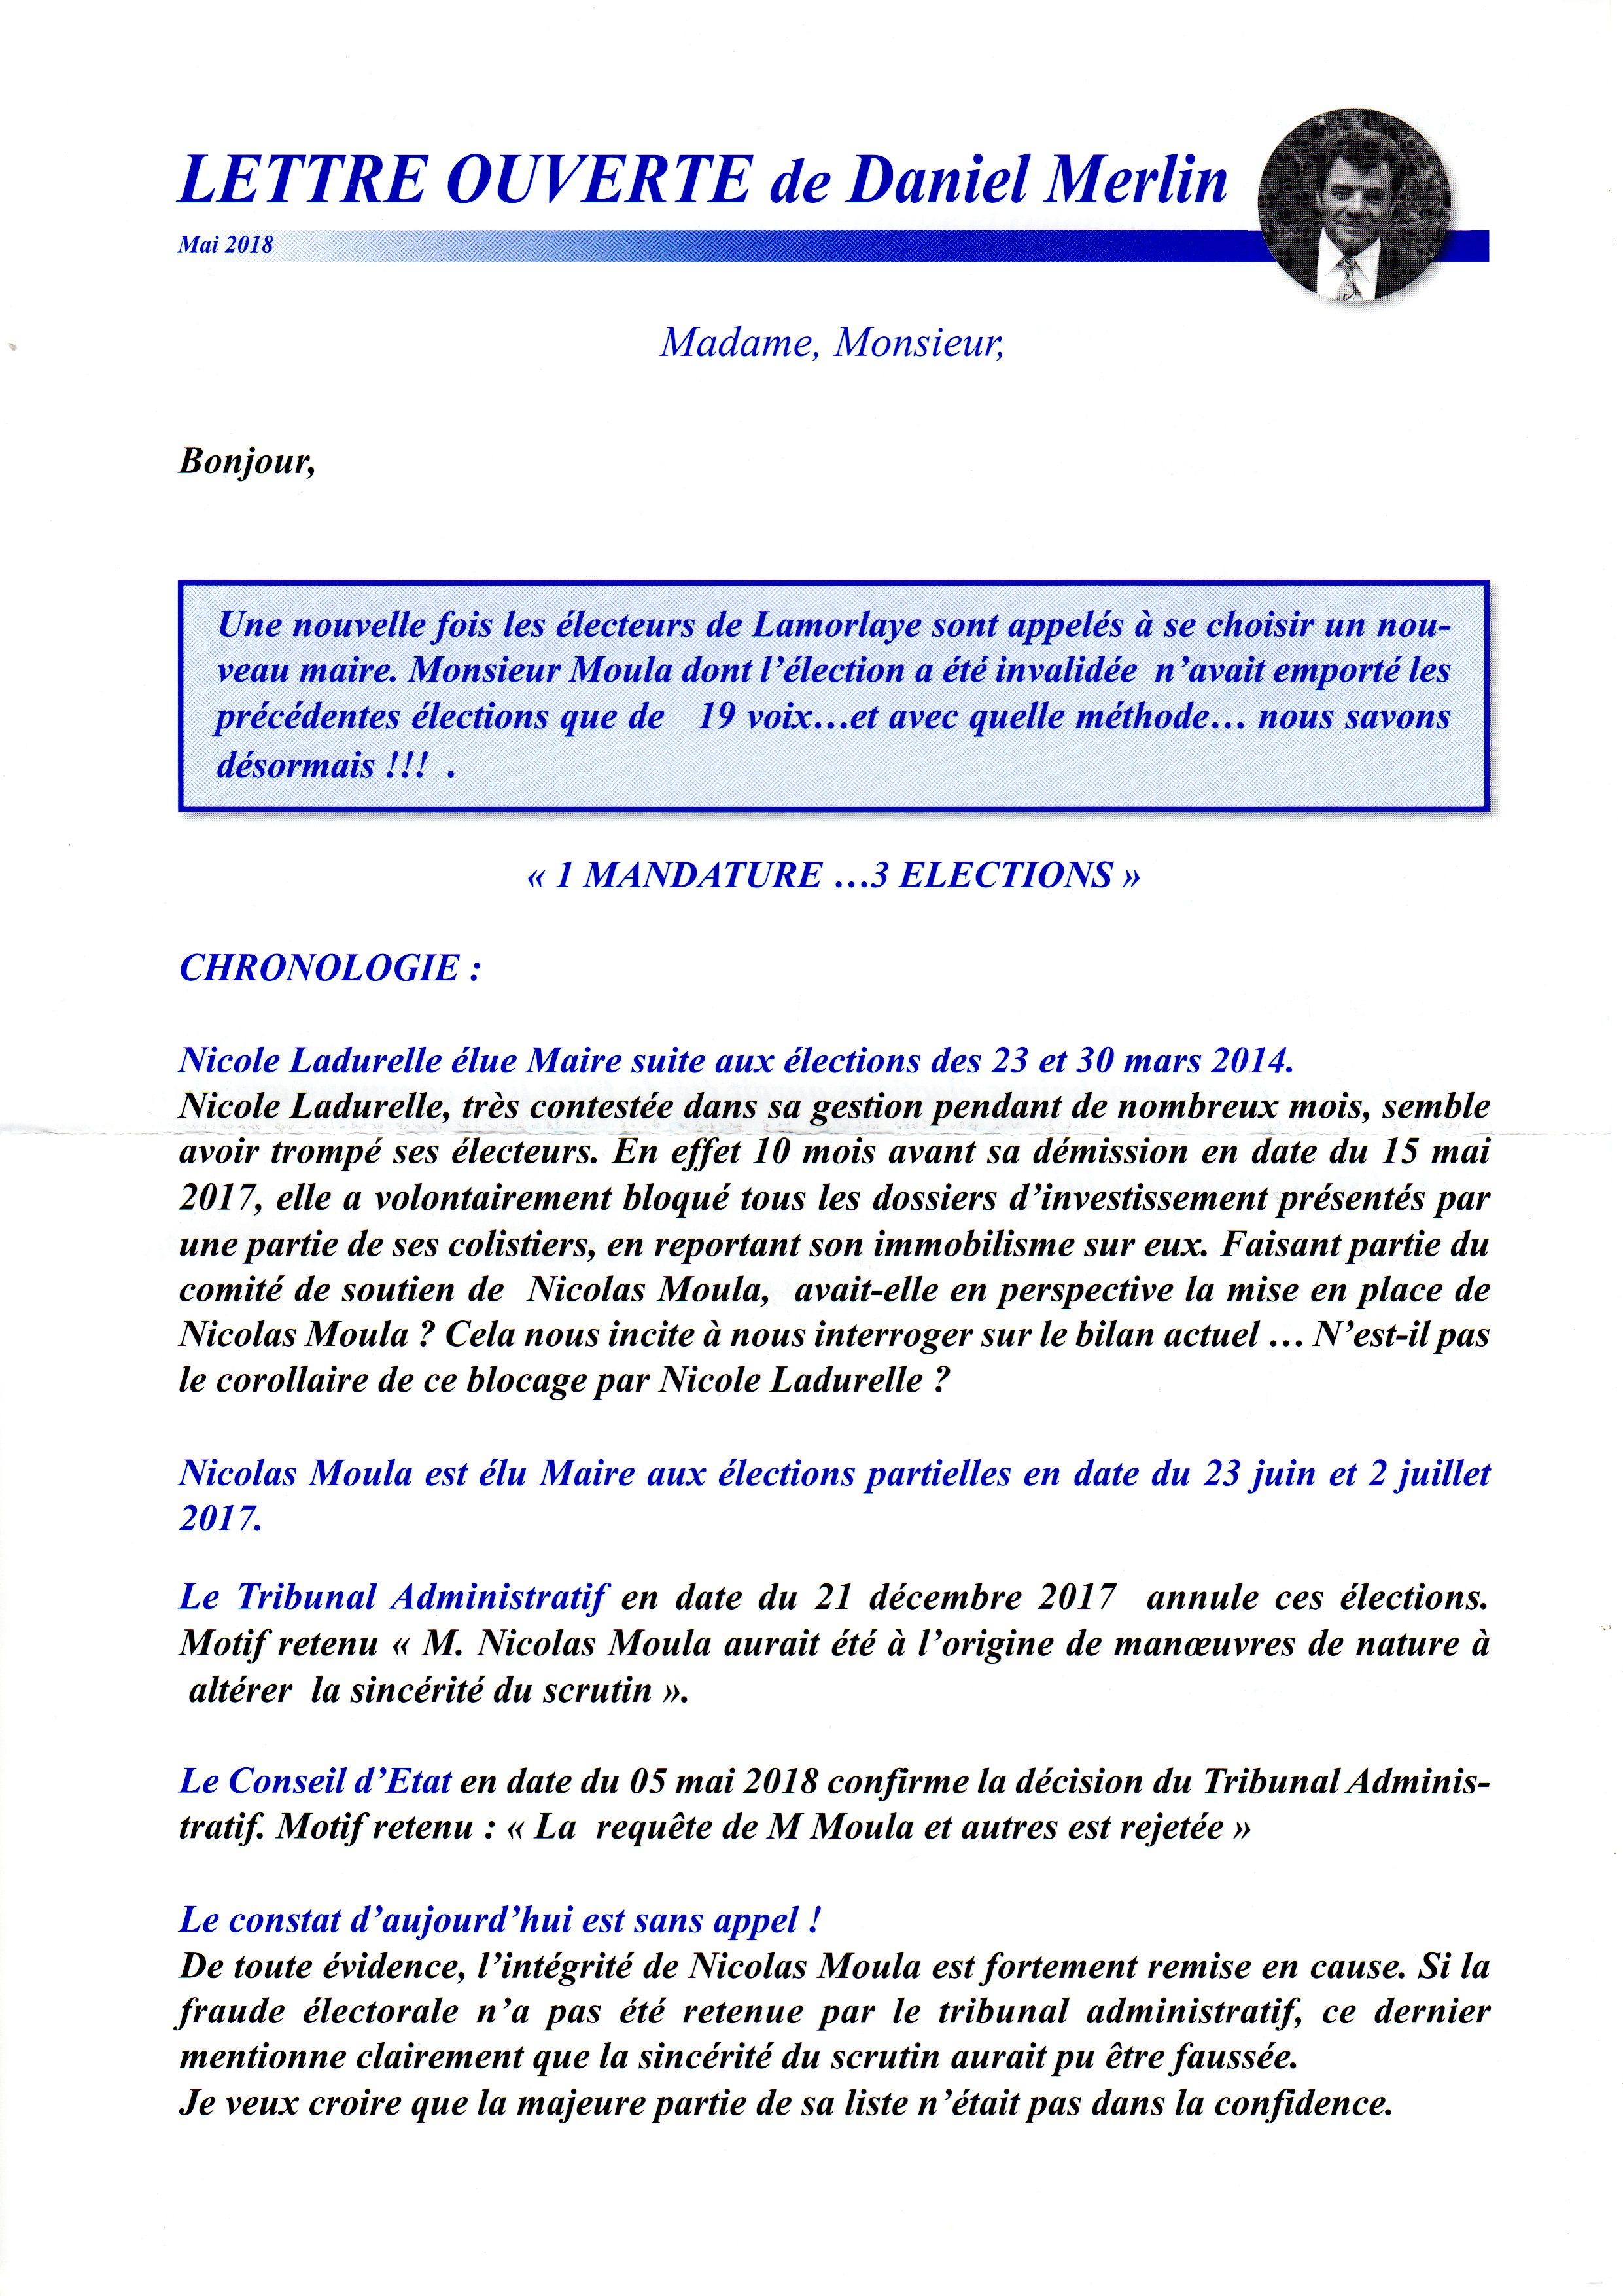 Daniel Merlin - Lettre ouverte 201805 p1